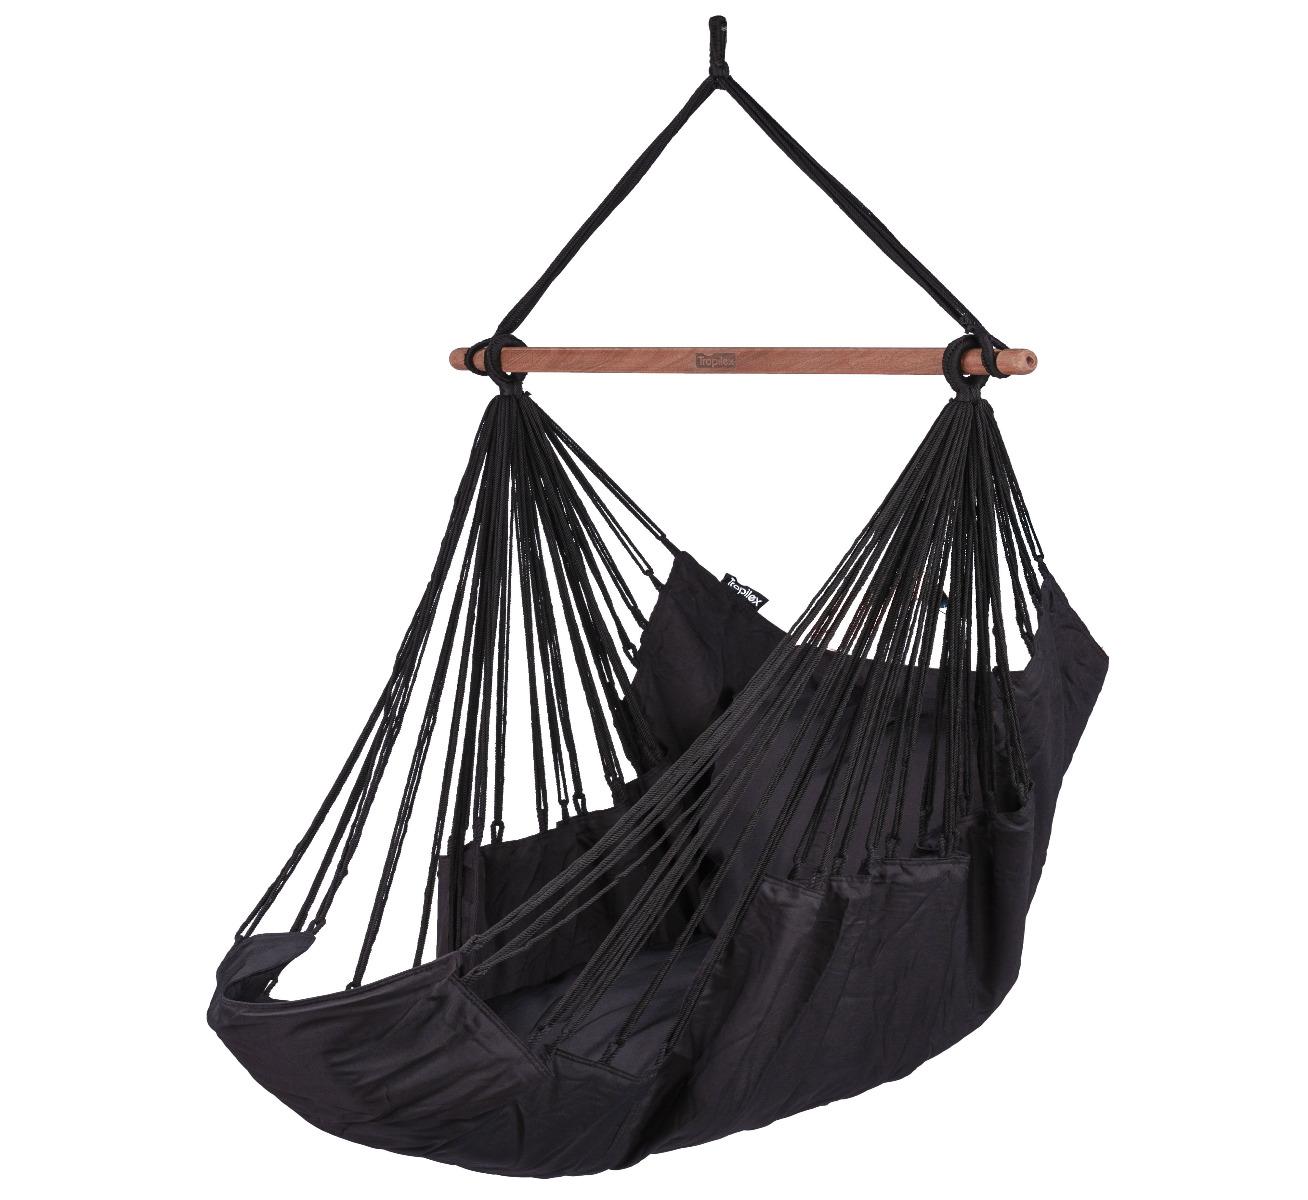 Hangstoel 'Sereno' Black - Tropilex �